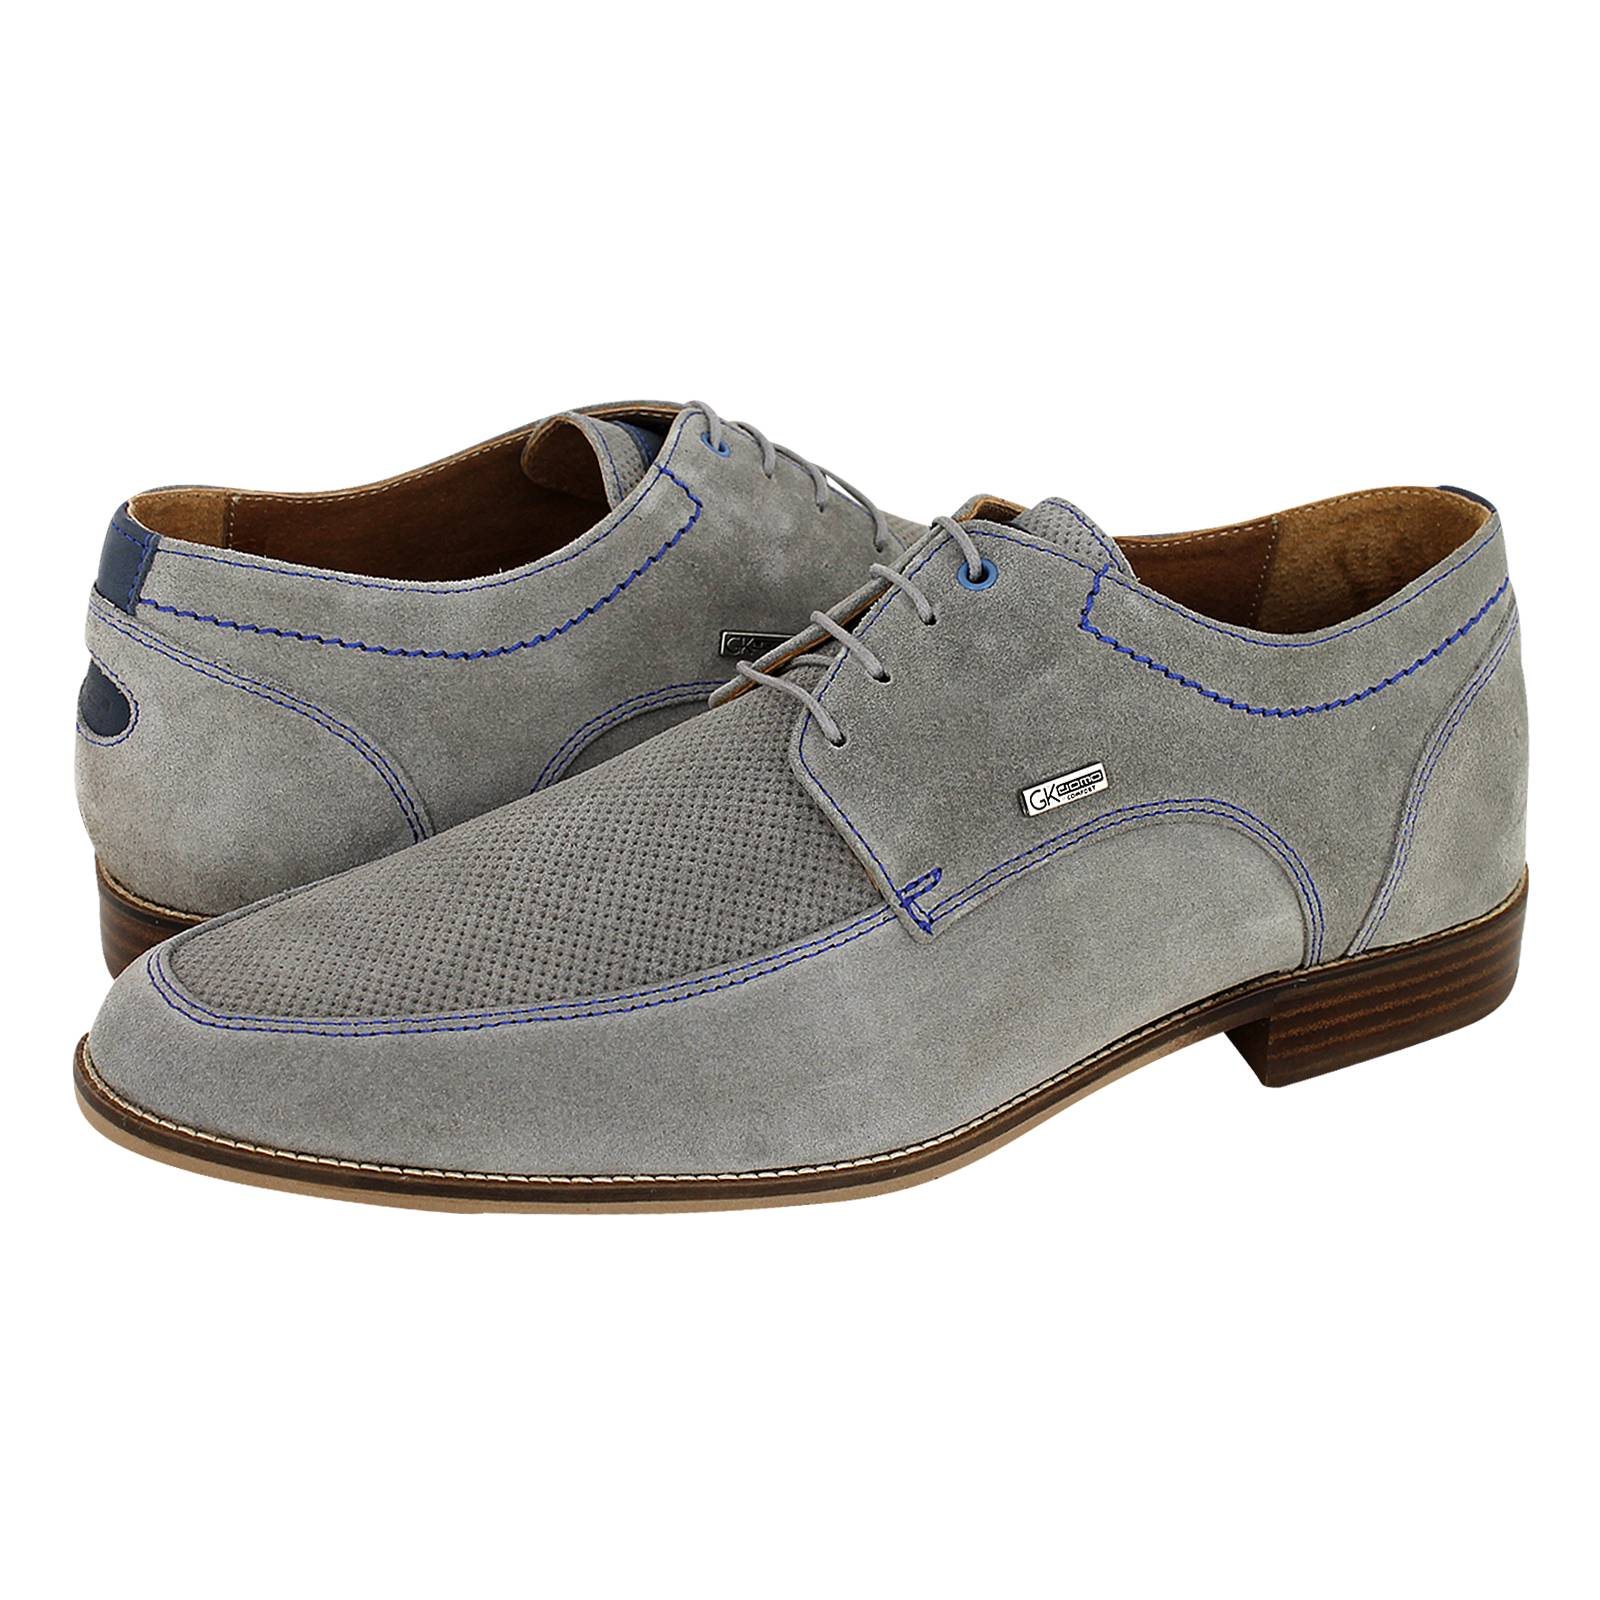 Sodhi - Ανδρικά δετά παπούτσια GK Uomo Comfort από καστορι τρυπητο ... 917303ac758